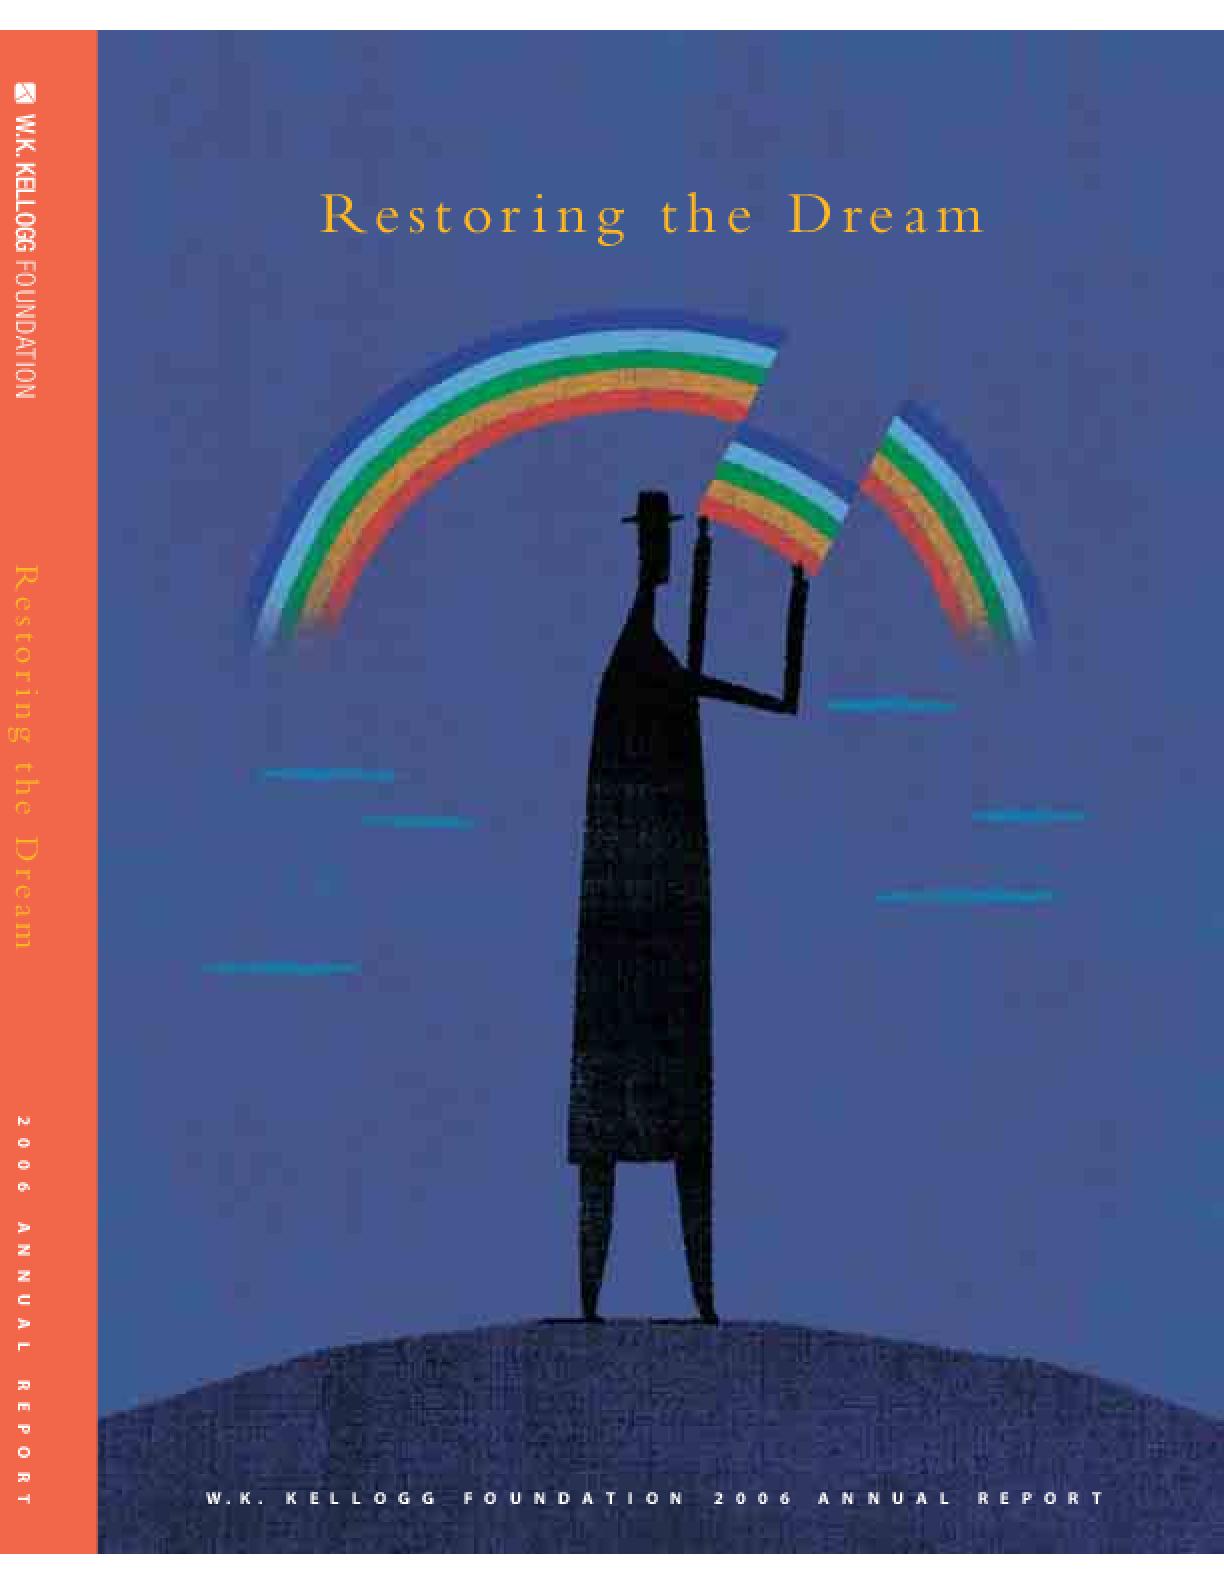 Restoring the Dream: 2006 Annual Report